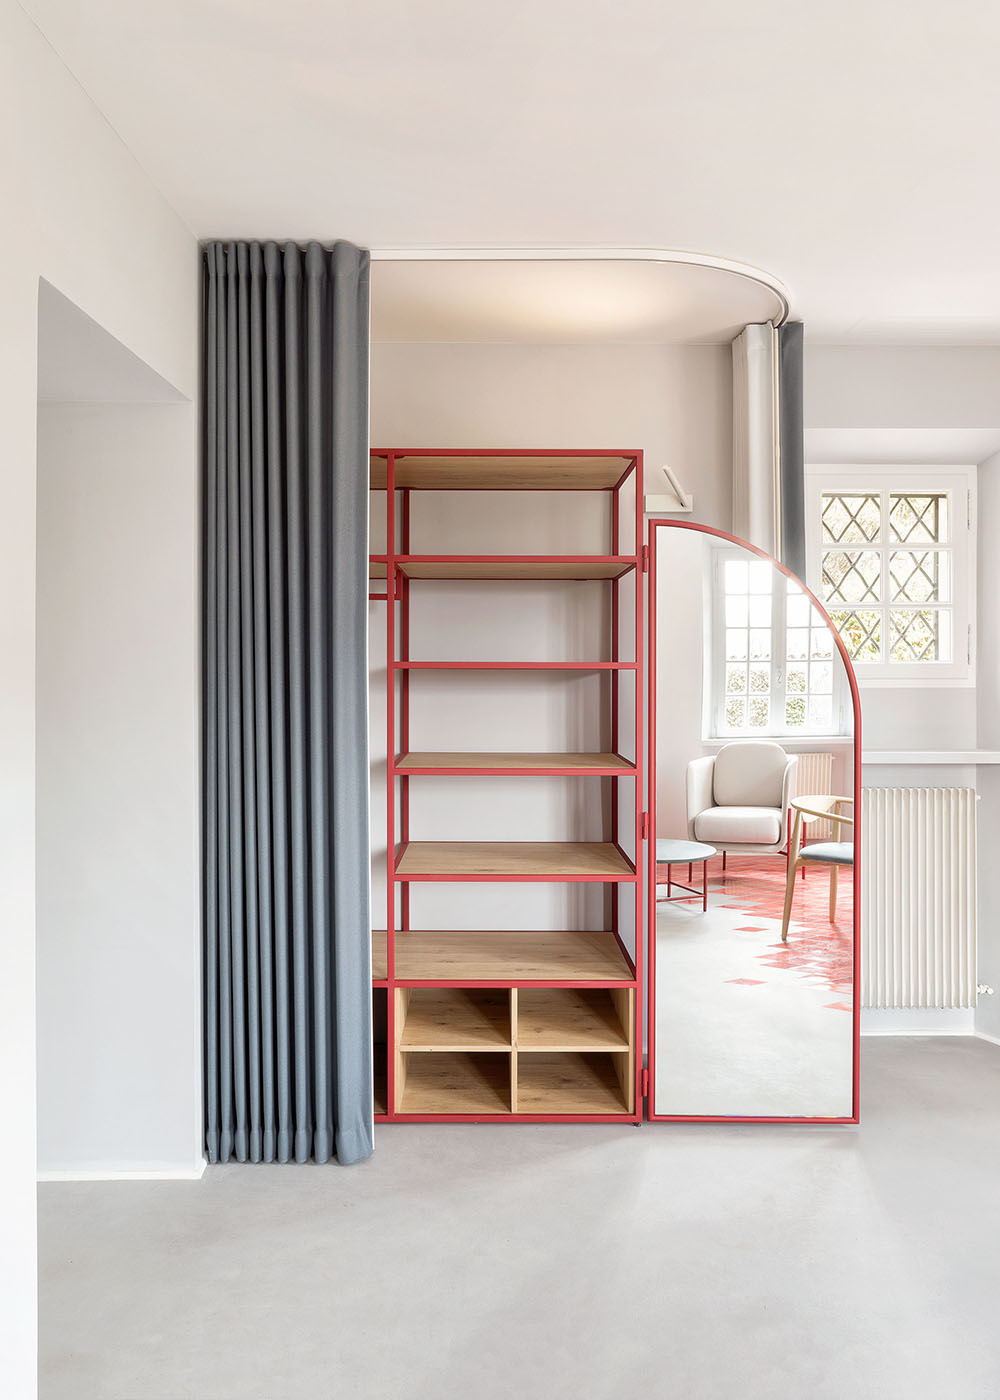 Парад дизайна во Франции: 5 комнат от декораторов (галерея 16, фото 3)